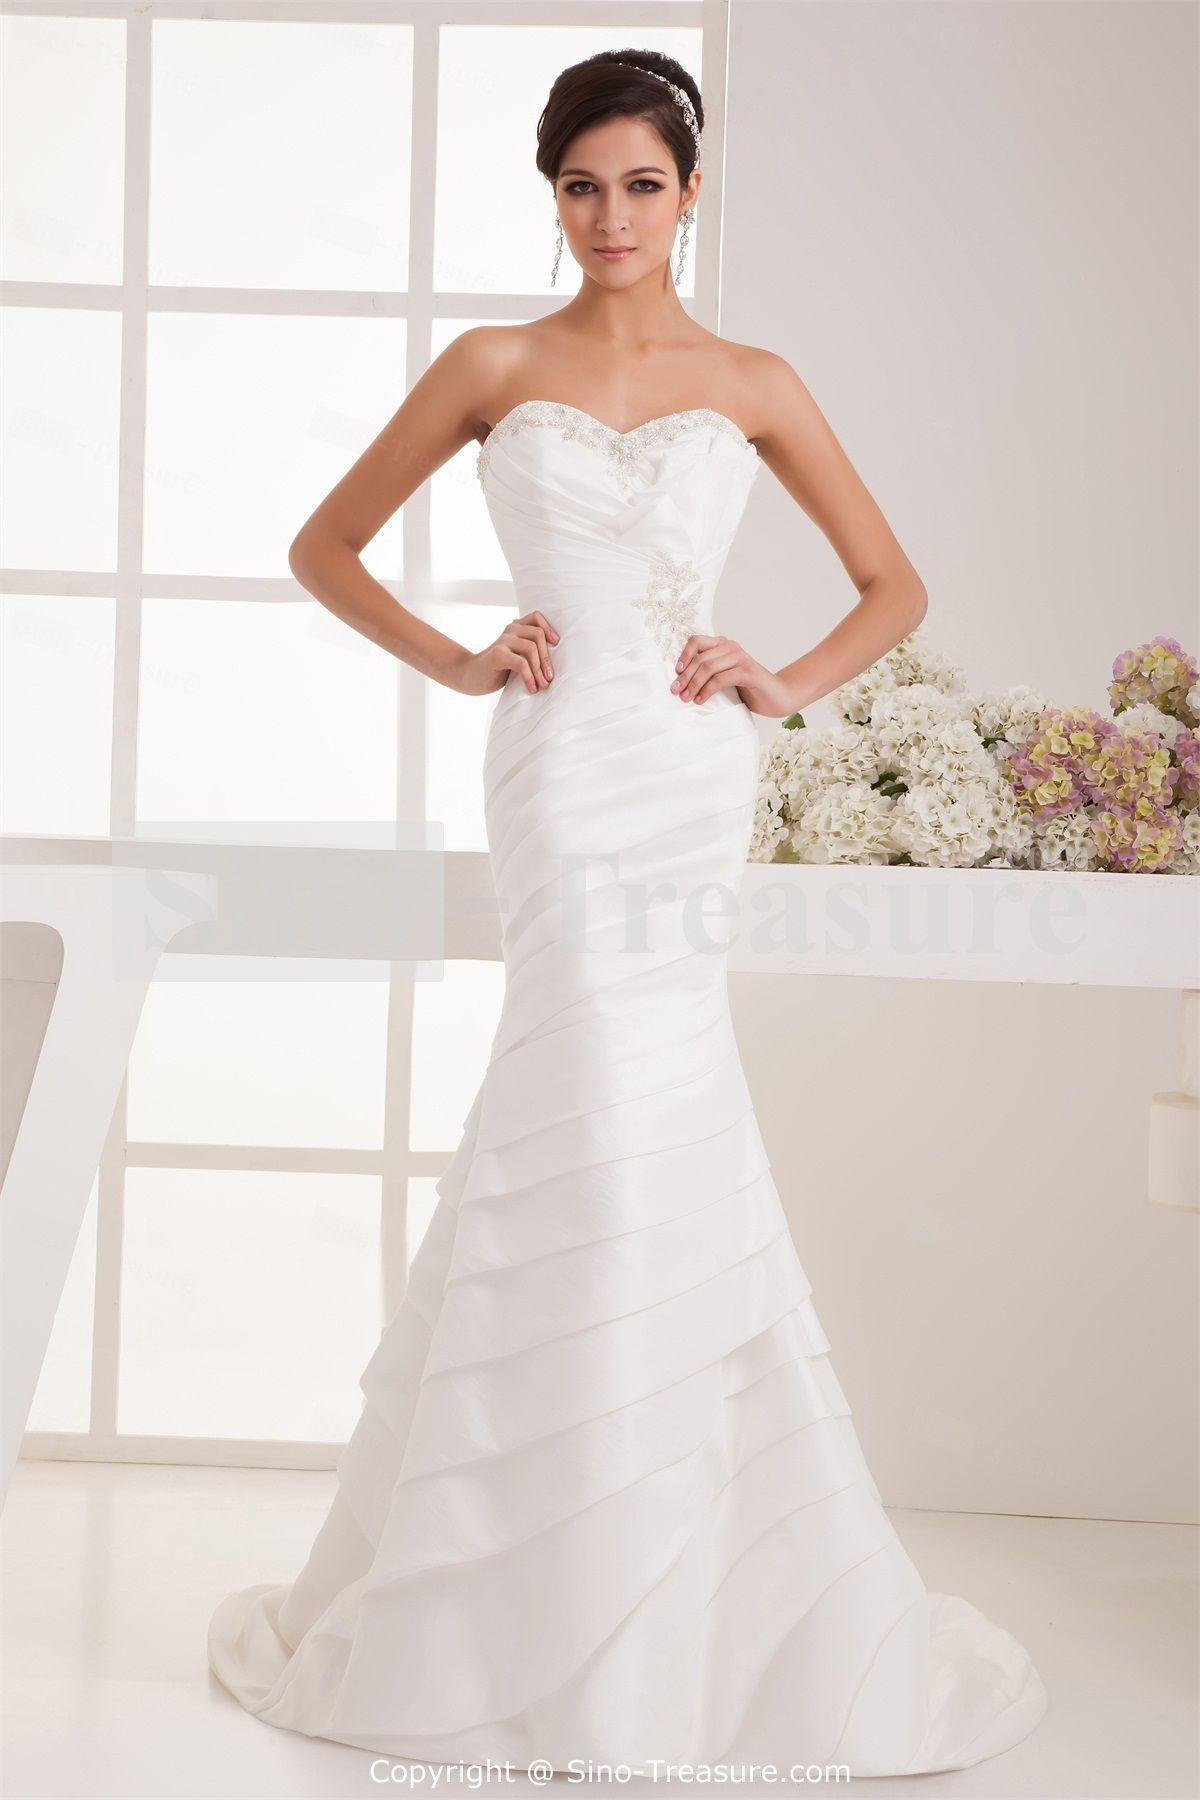 trumpet style wedding dress White Beading Mermaid Trumpet Sweetheart Taffeta Wedding Dress Wedding Events Wedding Dresses